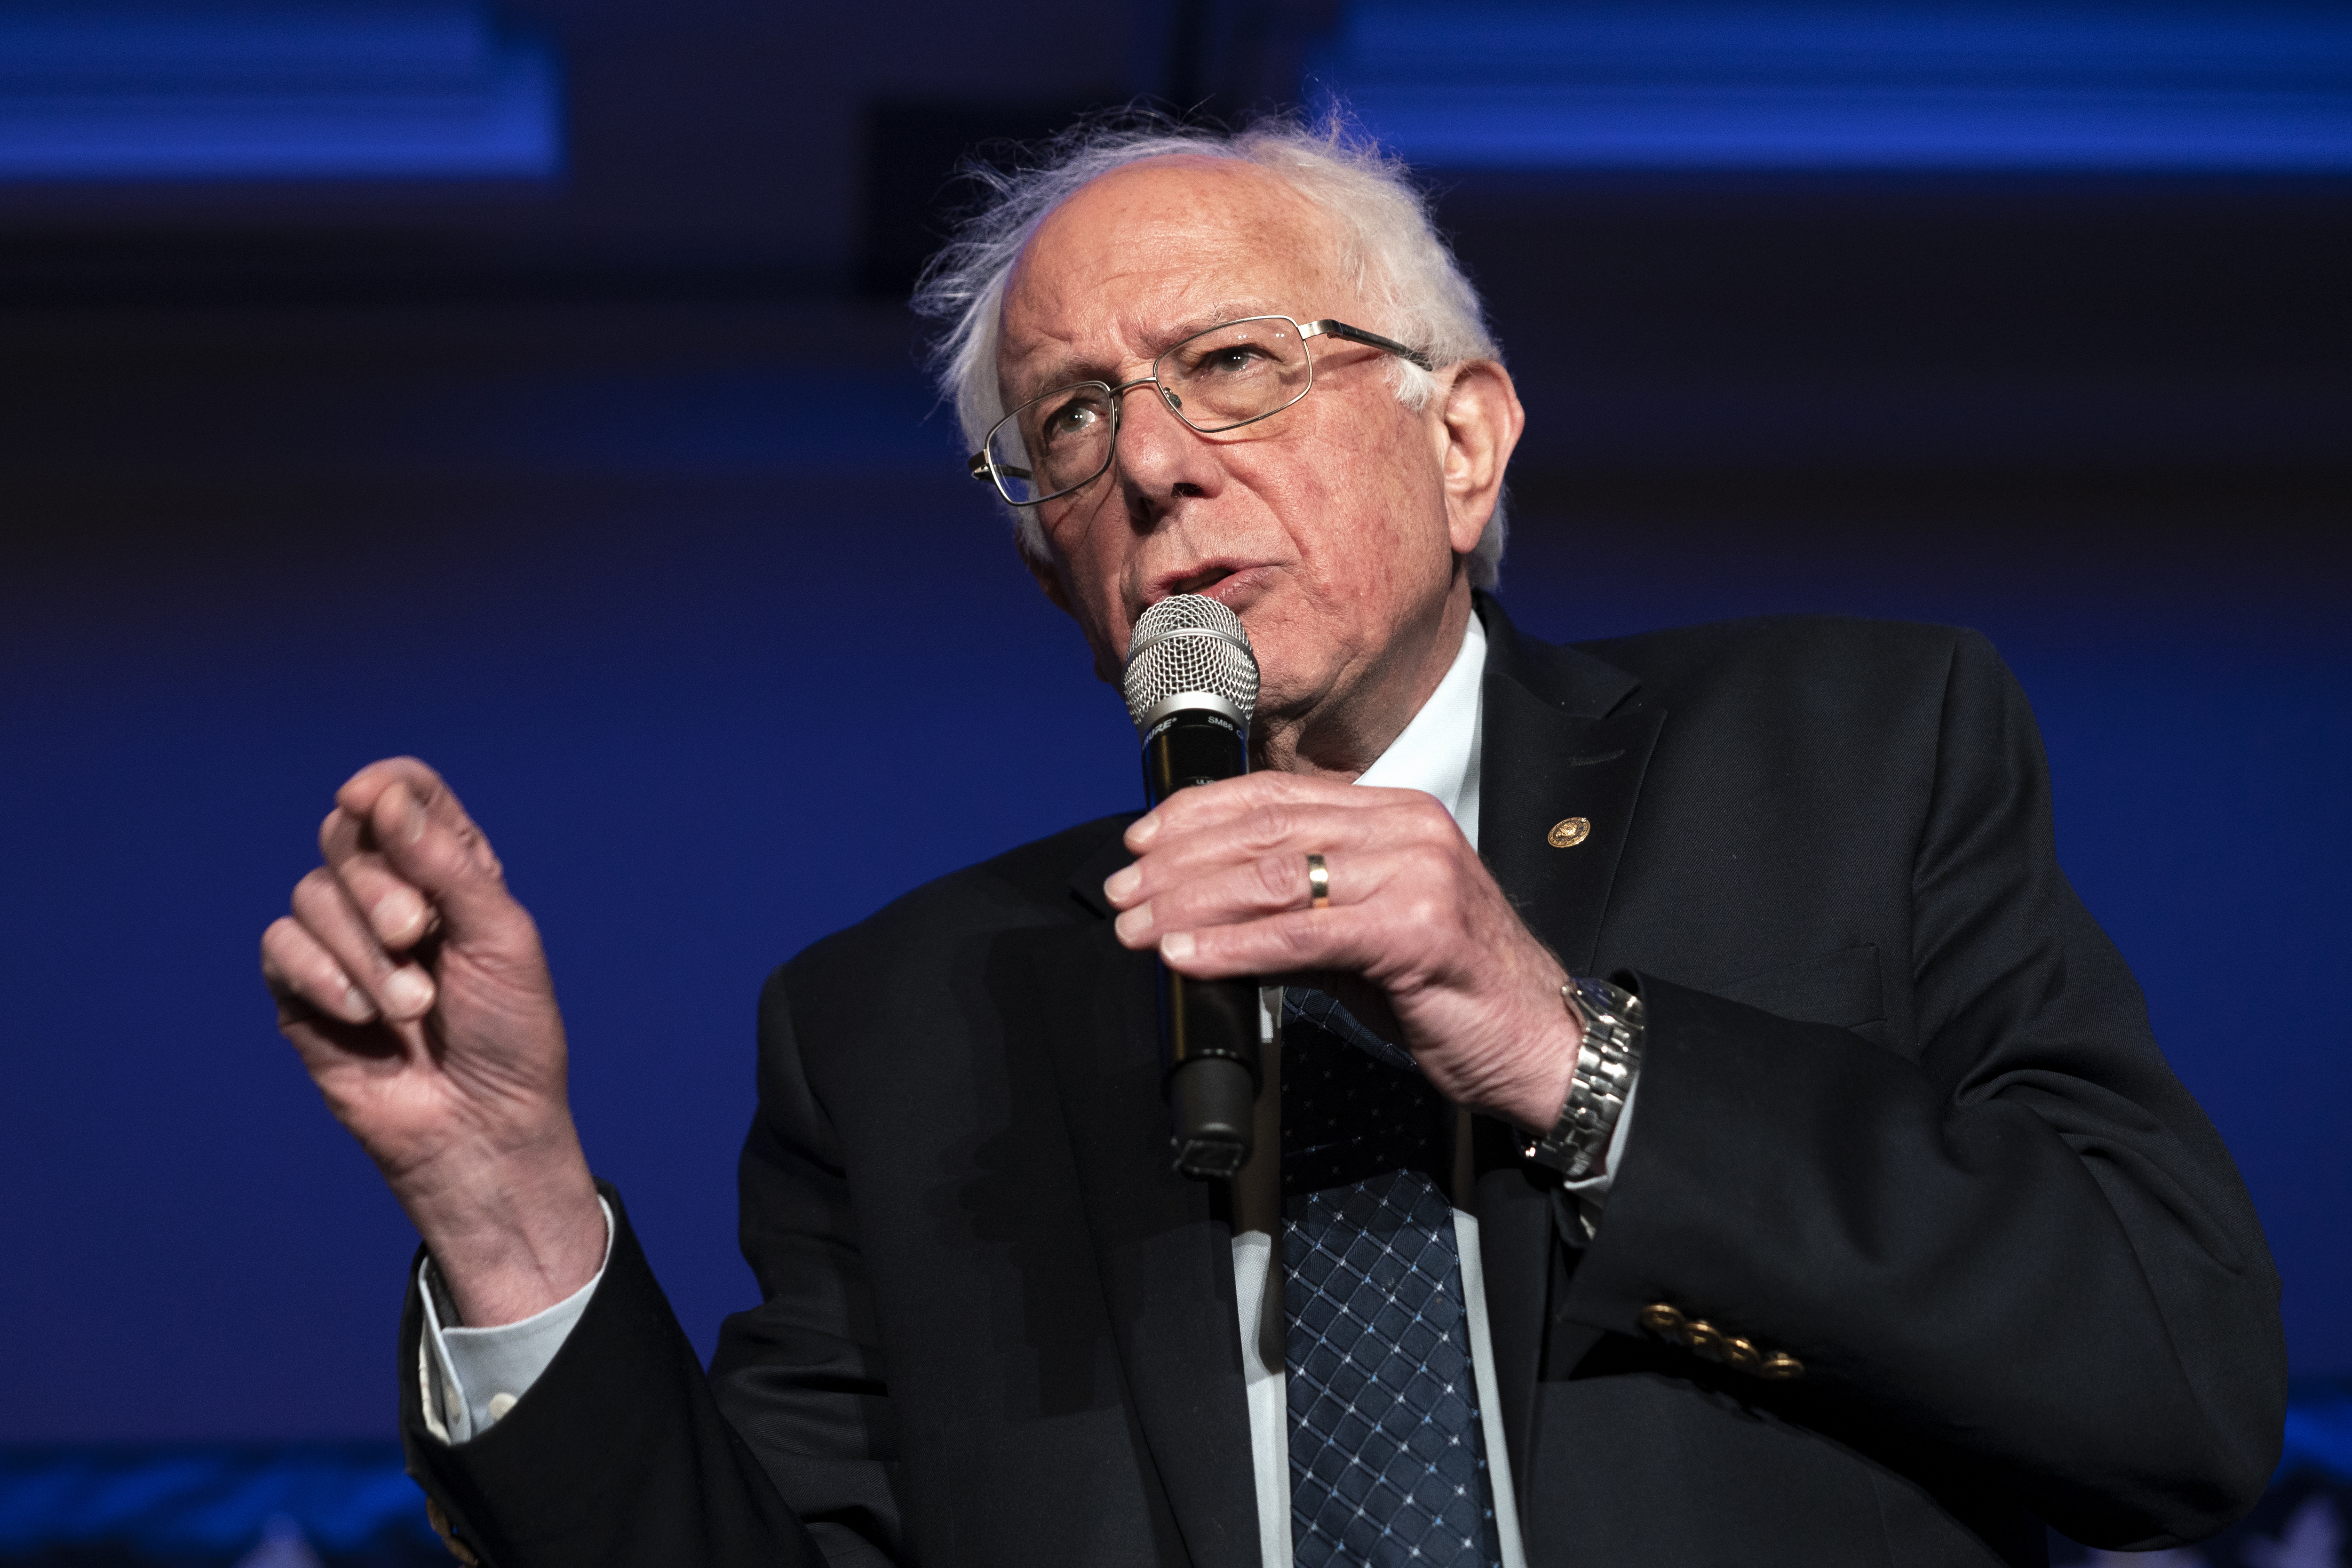 U.S. Senator and presidential candidate, Bernie Sanders,